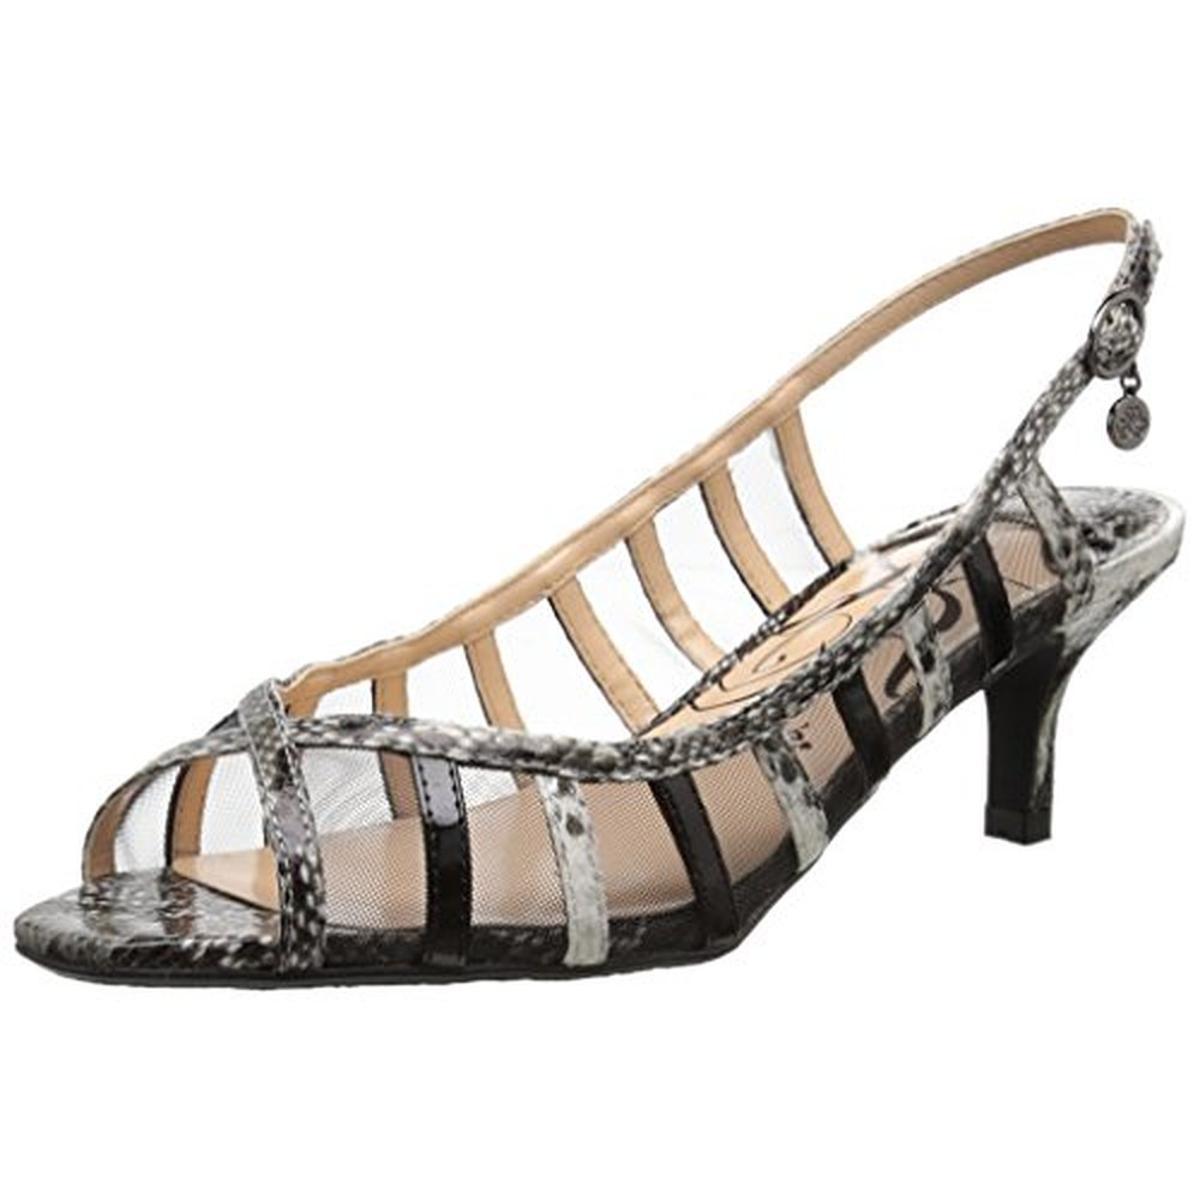 J. Renee Womens Rebeka Open Toe Slingback Heels